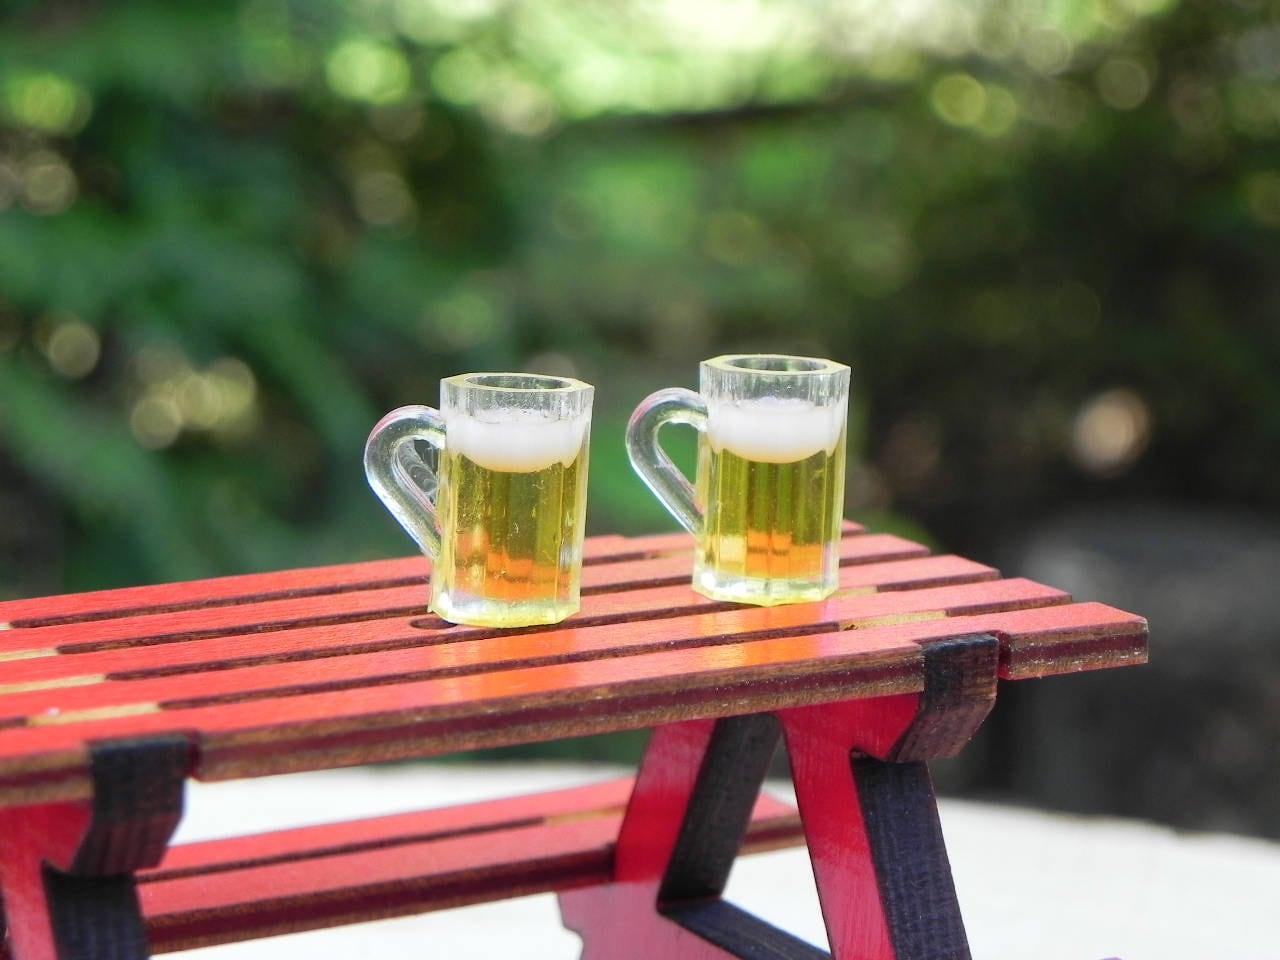 Miniature Beer Mugs Glasses Fairy Garden Miniatures